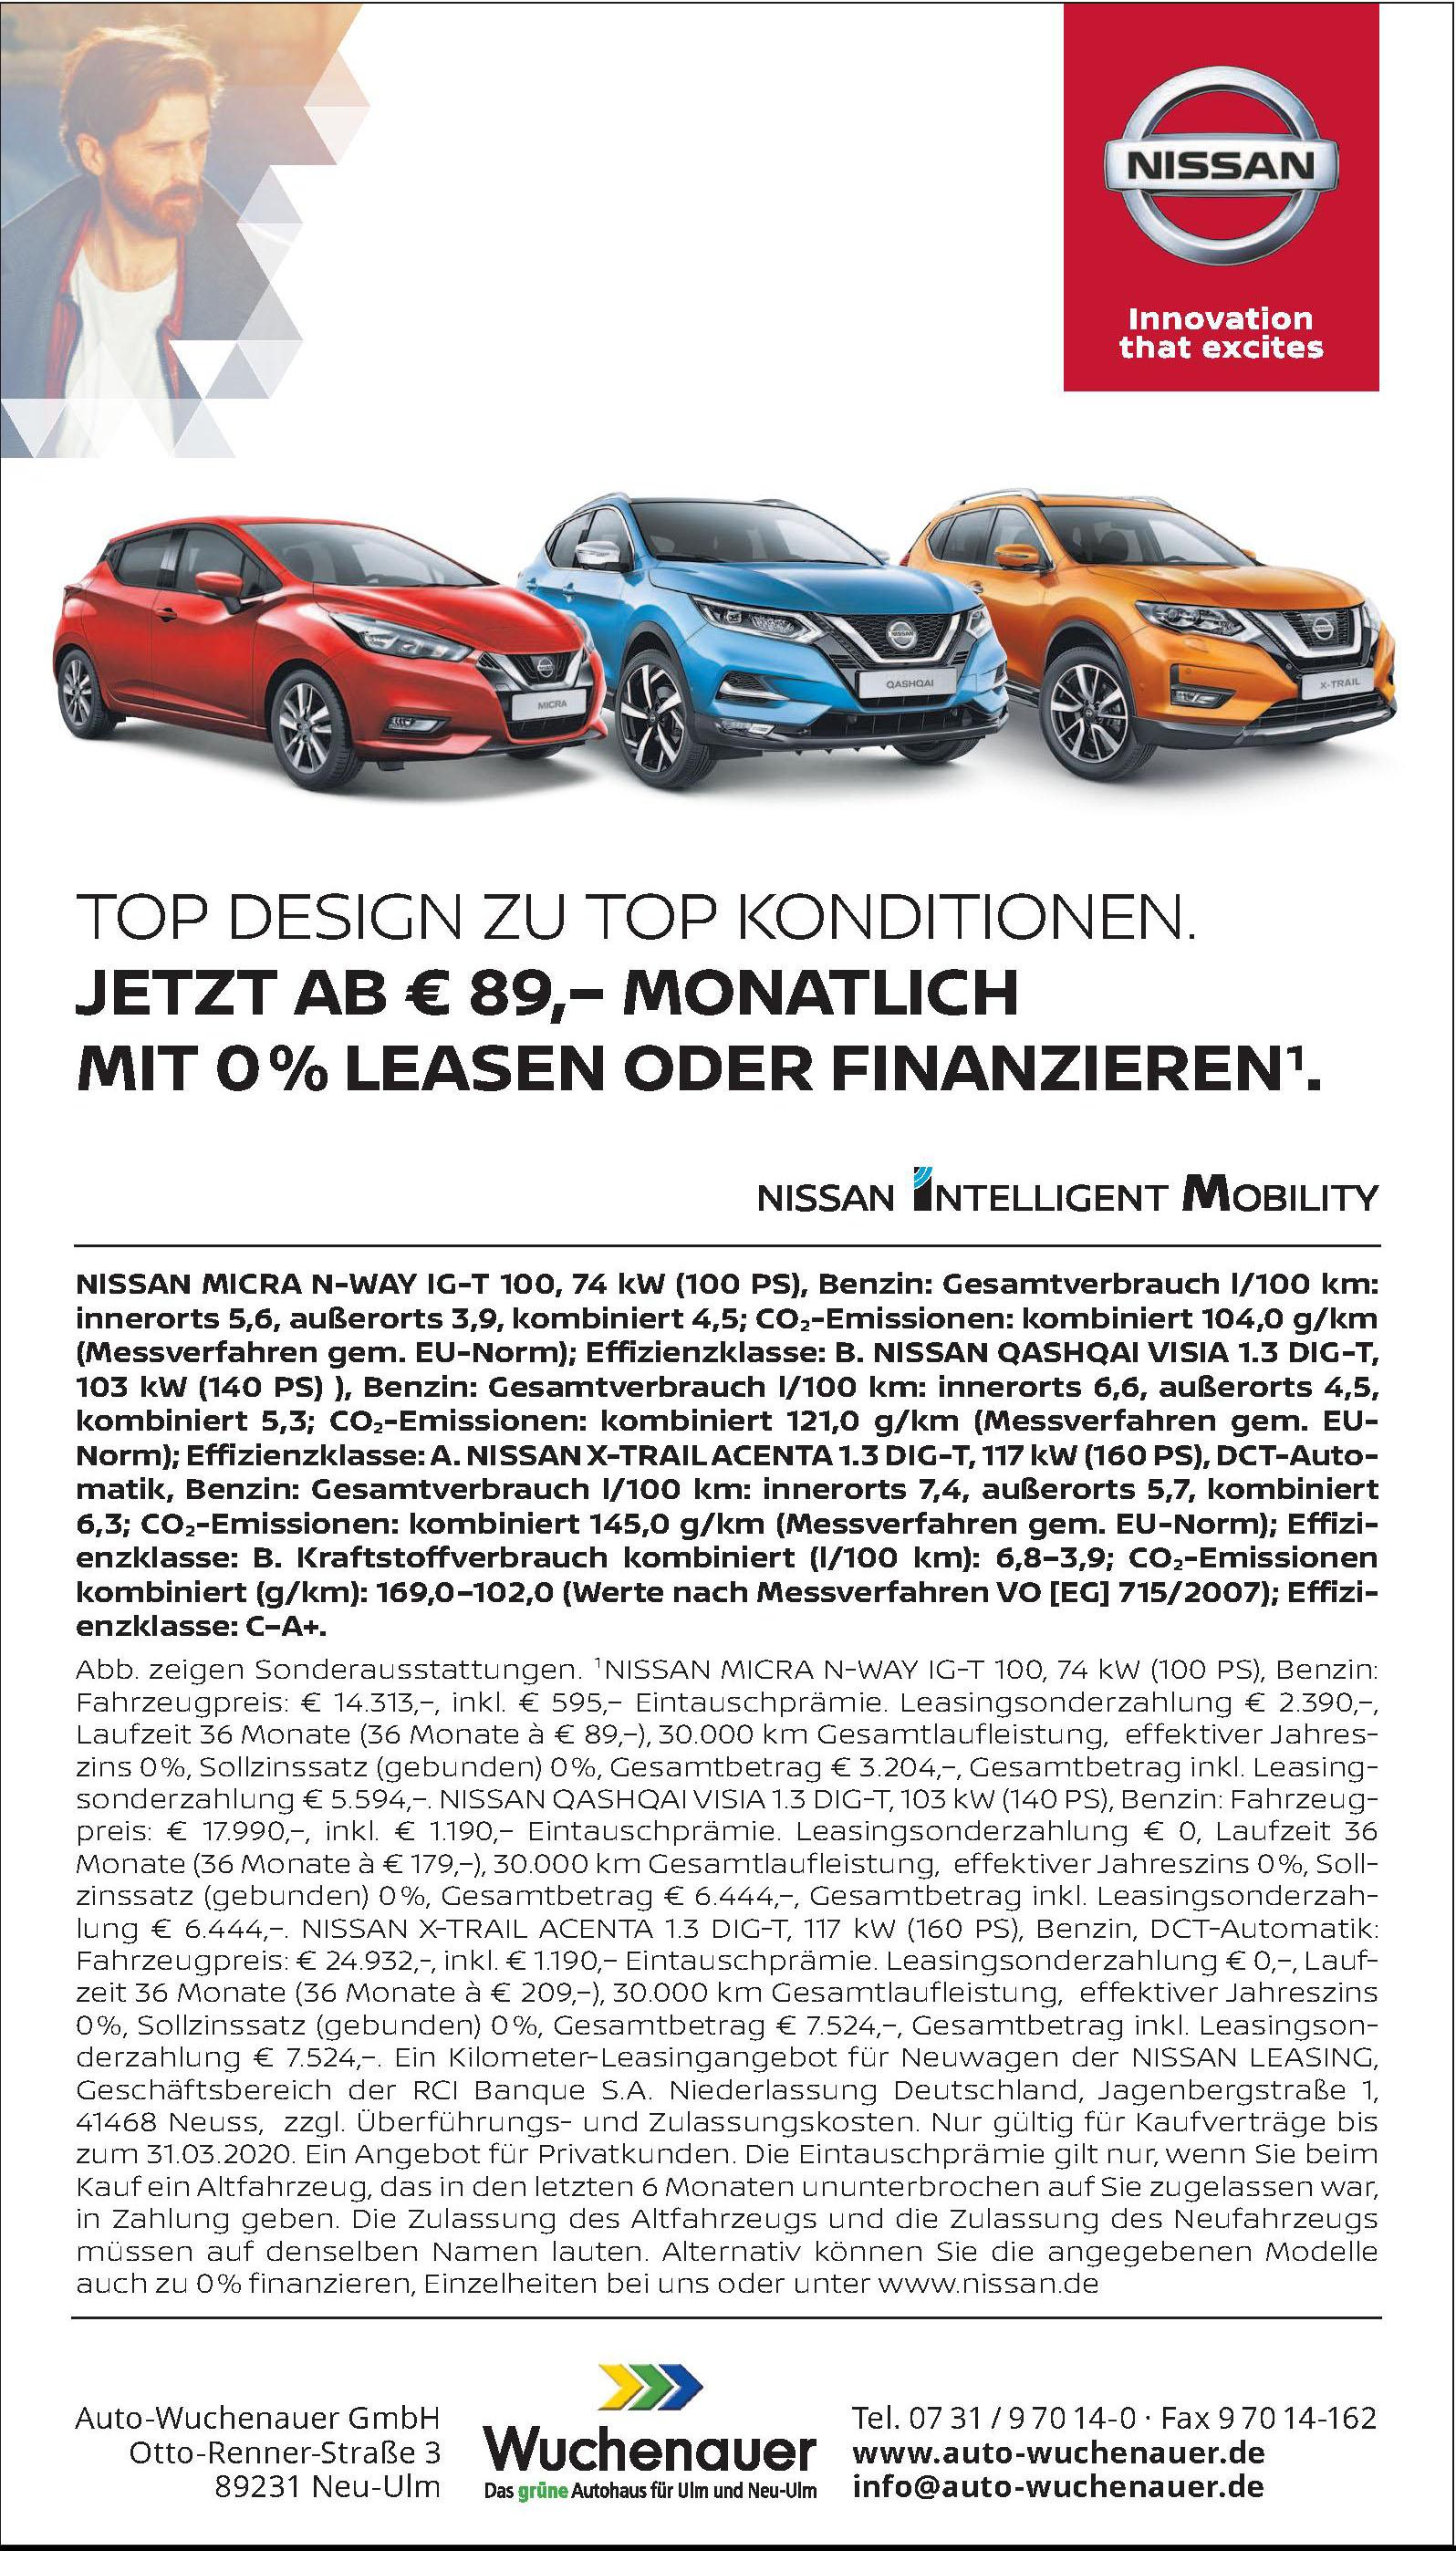 Auto Wuchenauer GmbH